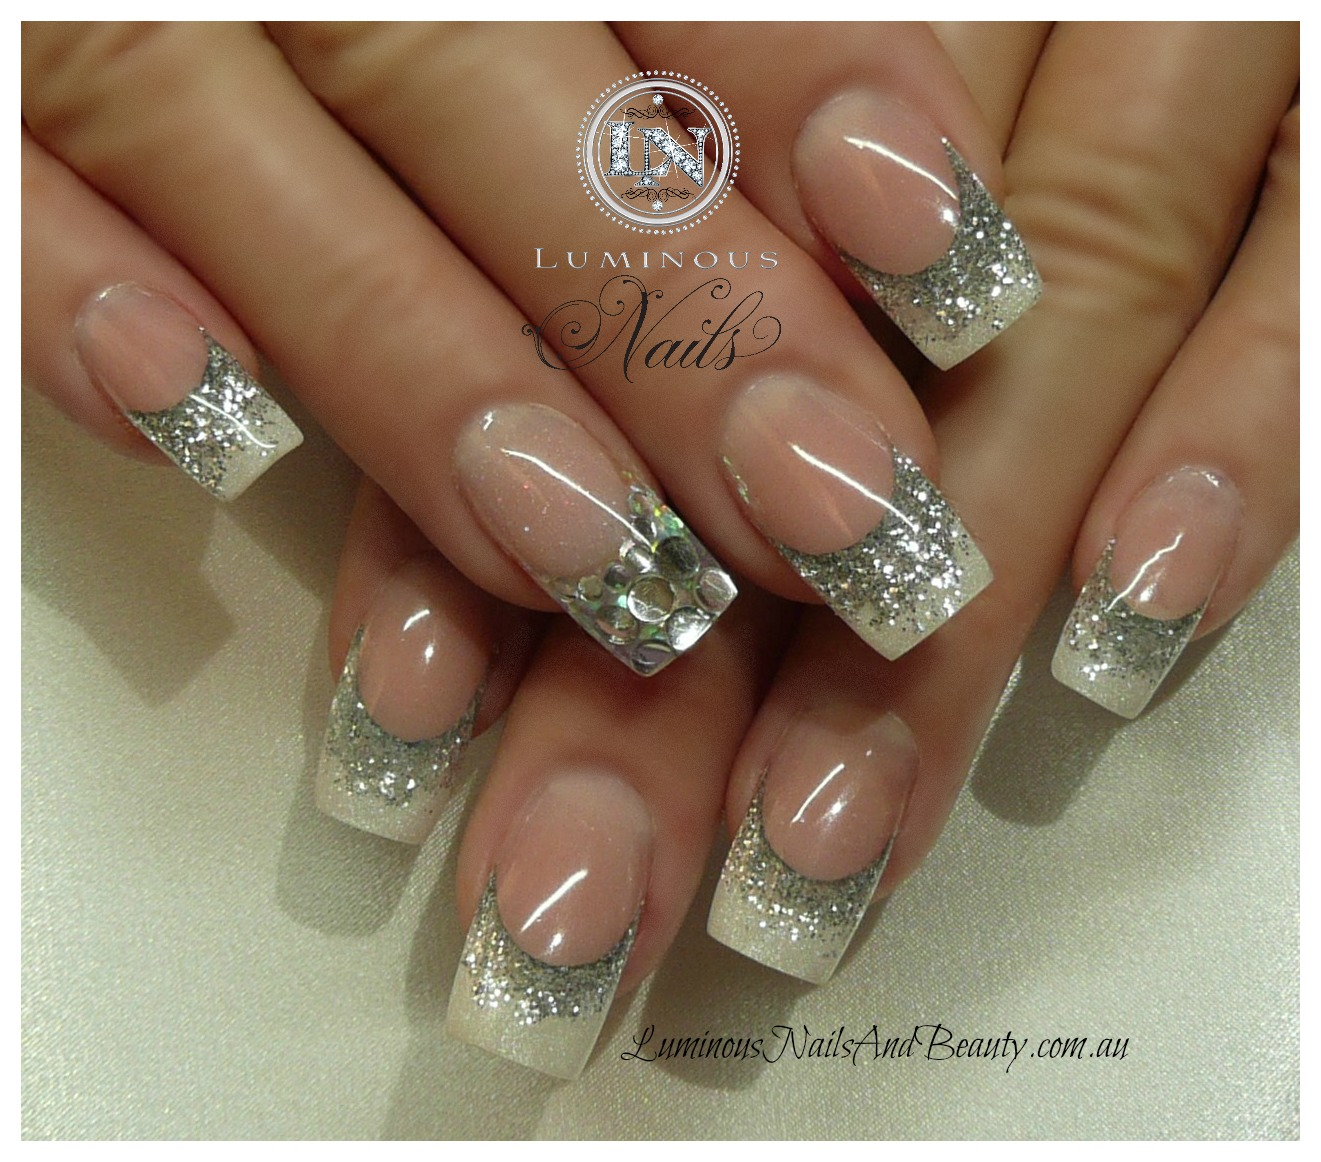 Acrylic Nail Art Designs Gallery: Acrylic Nail Designs Glitter Tips